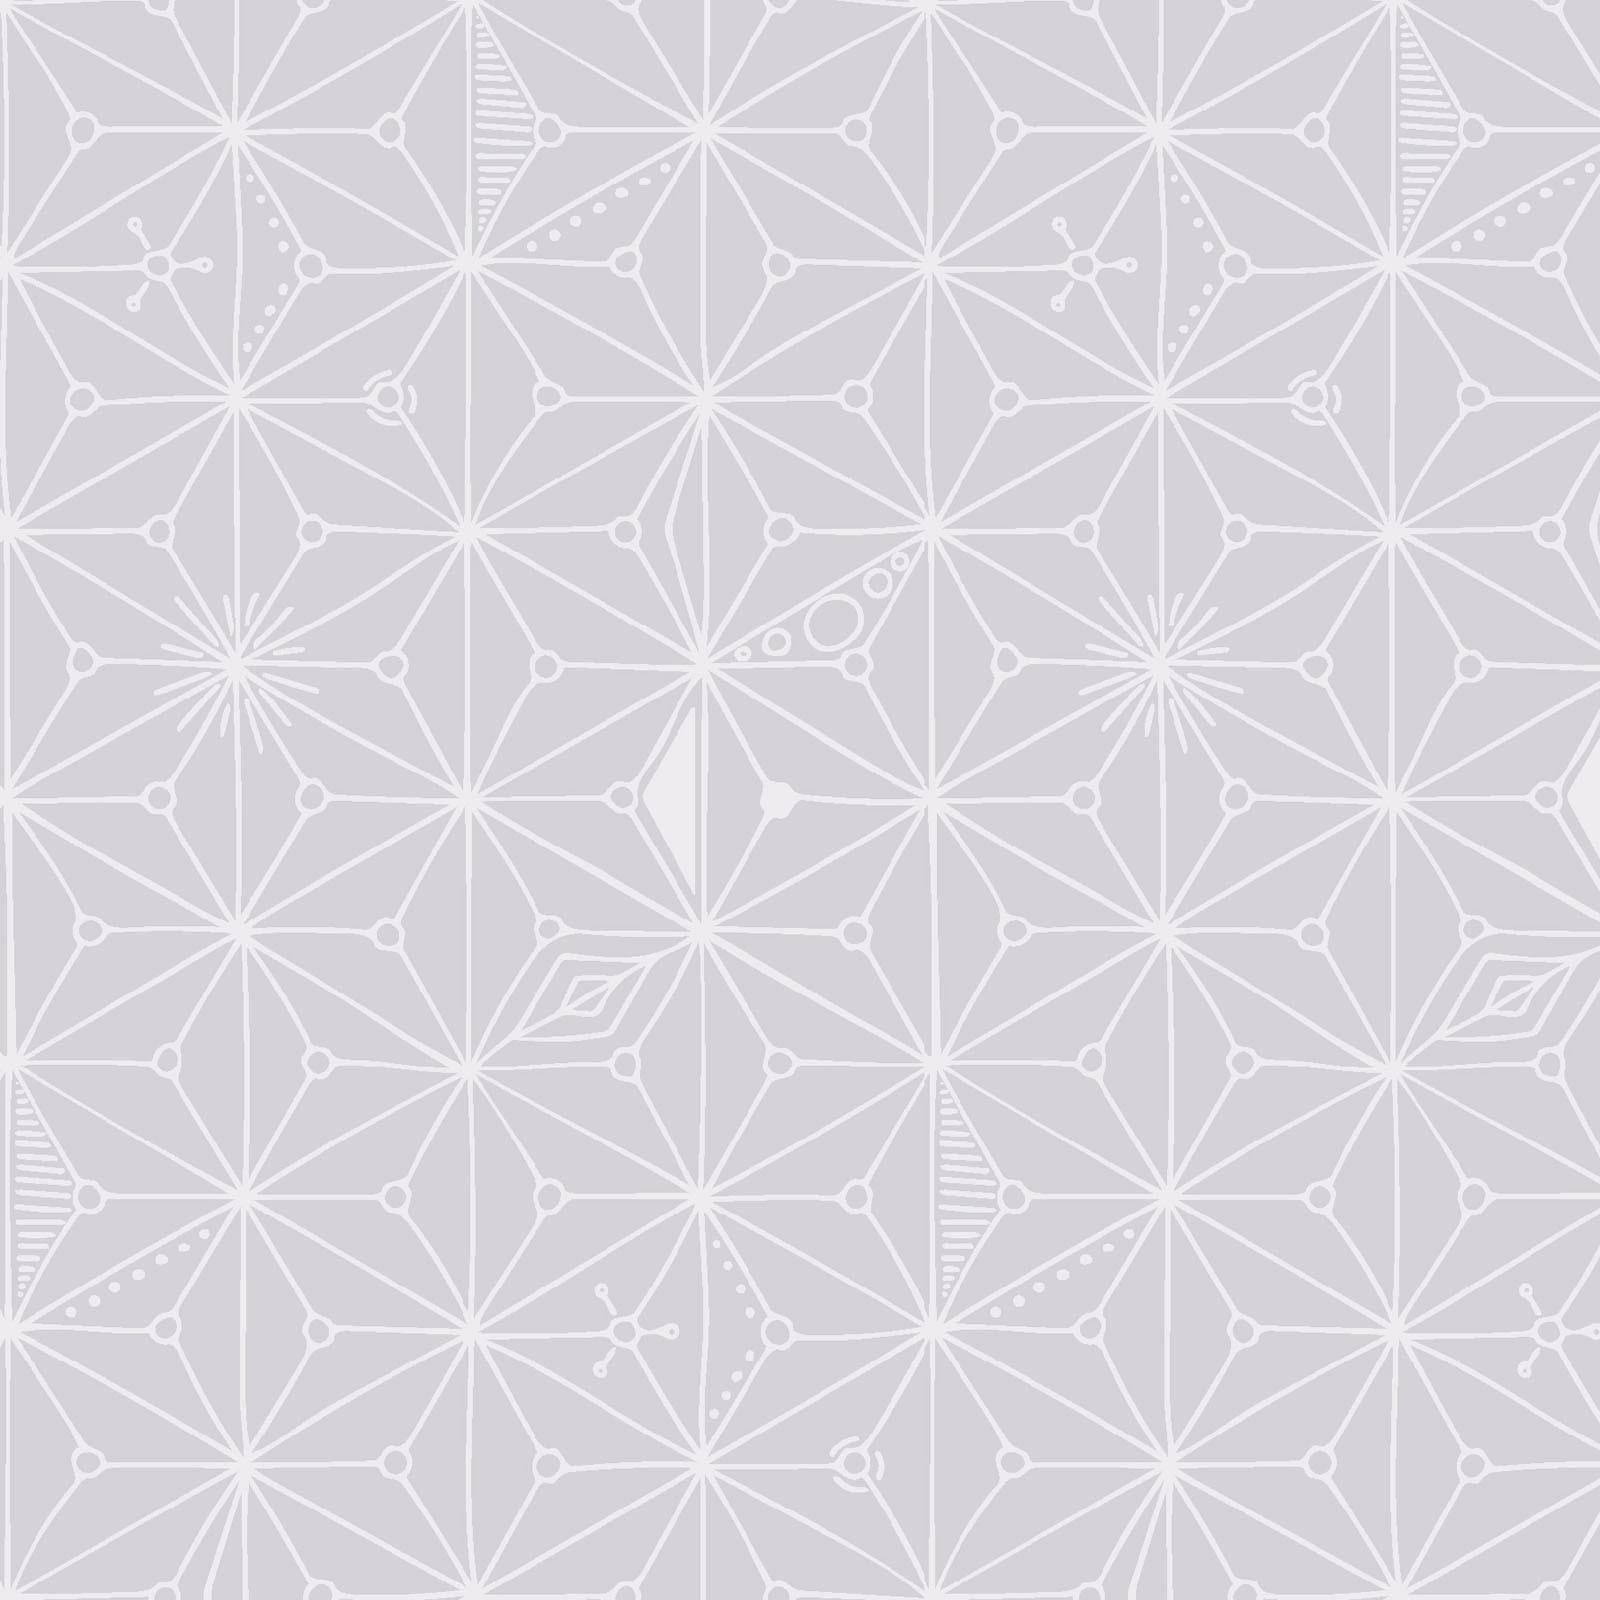 MAYWOOD MOONGATE, CONTINUUM Grey (Geometric), per cm or $18/m